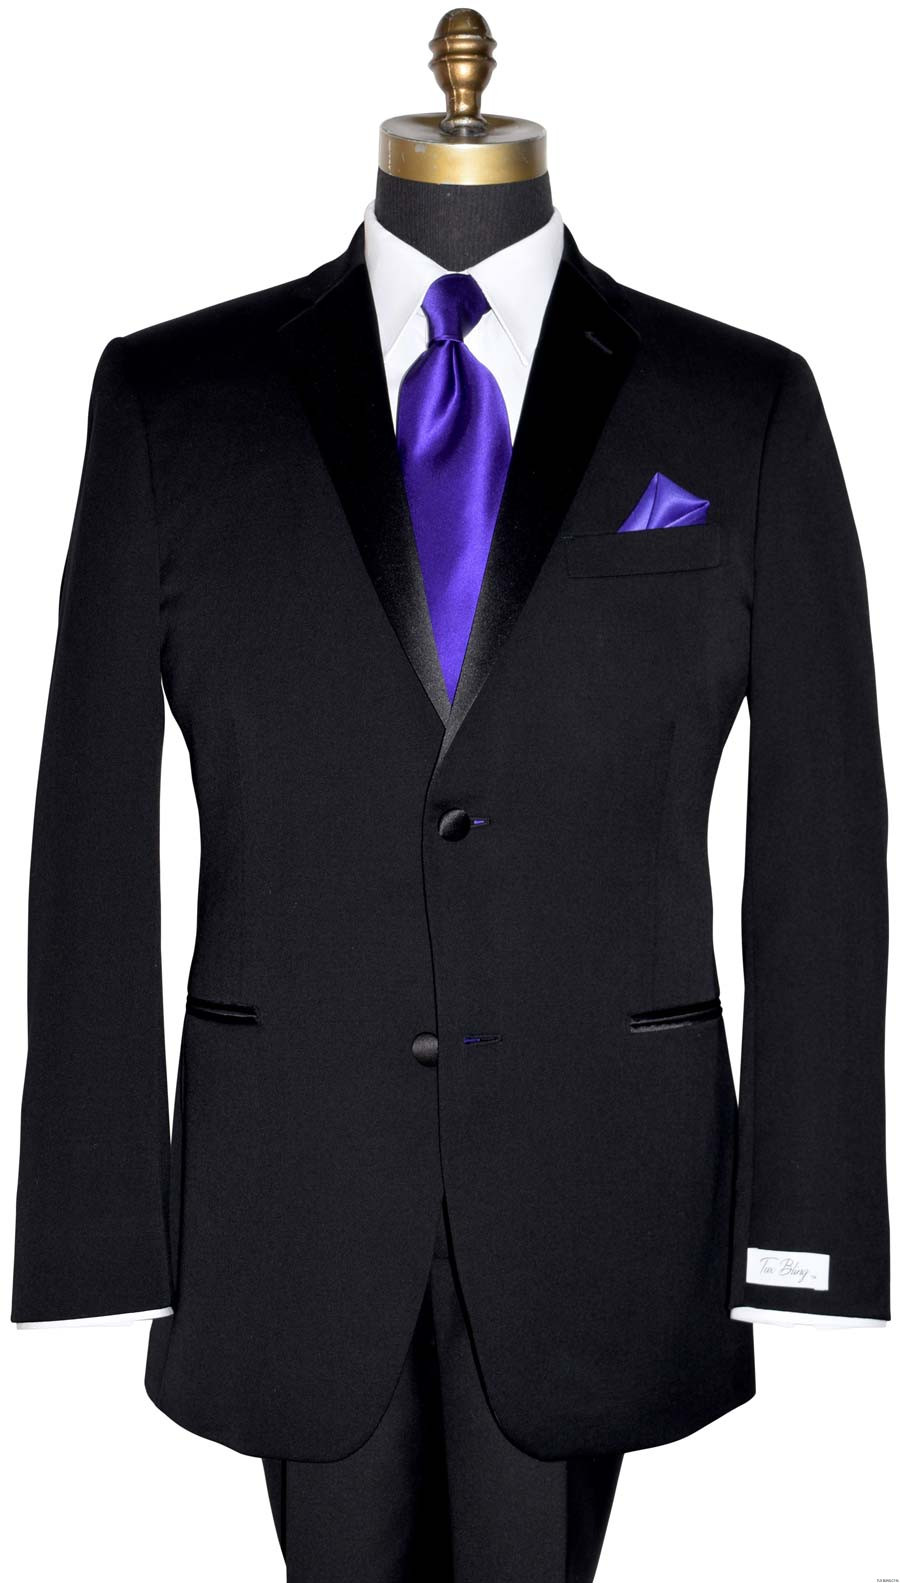 men's tuxbling.com black tuxedo with regal purple long silk tie and pocket hanky